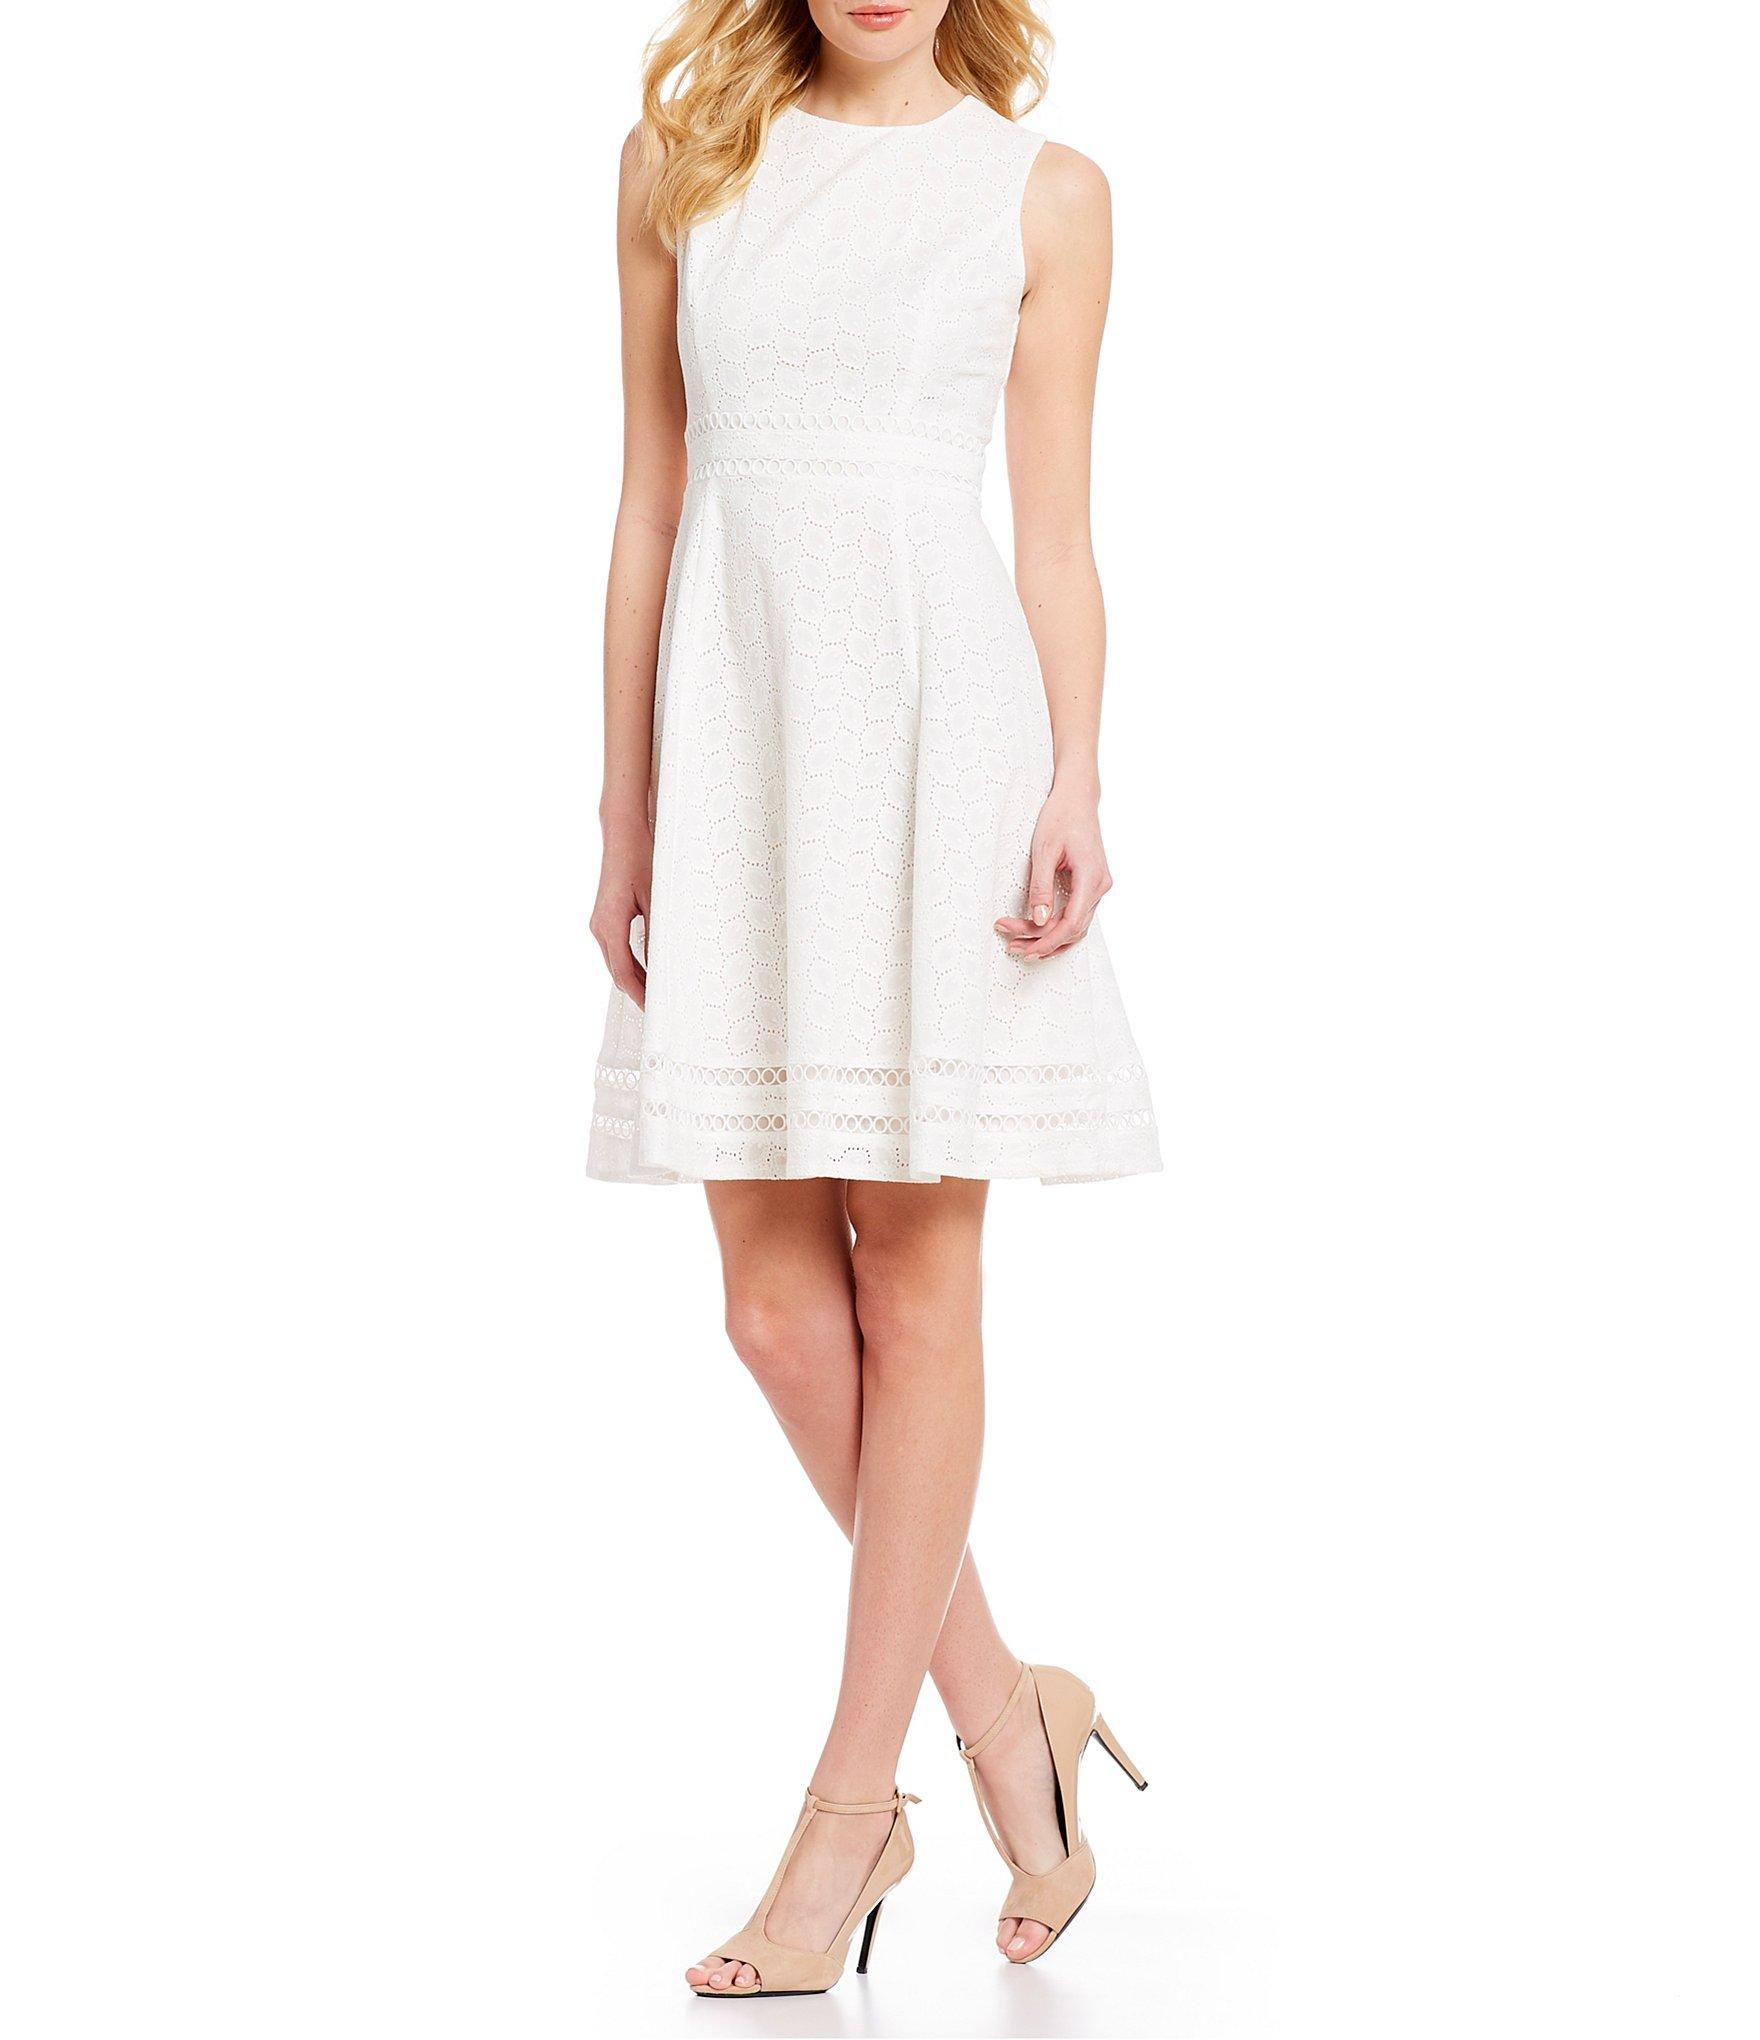 43dd96f176 Calvin Klein. Women s White Sleeveless Eyelet Illusion Hem Fit   Flare Dress